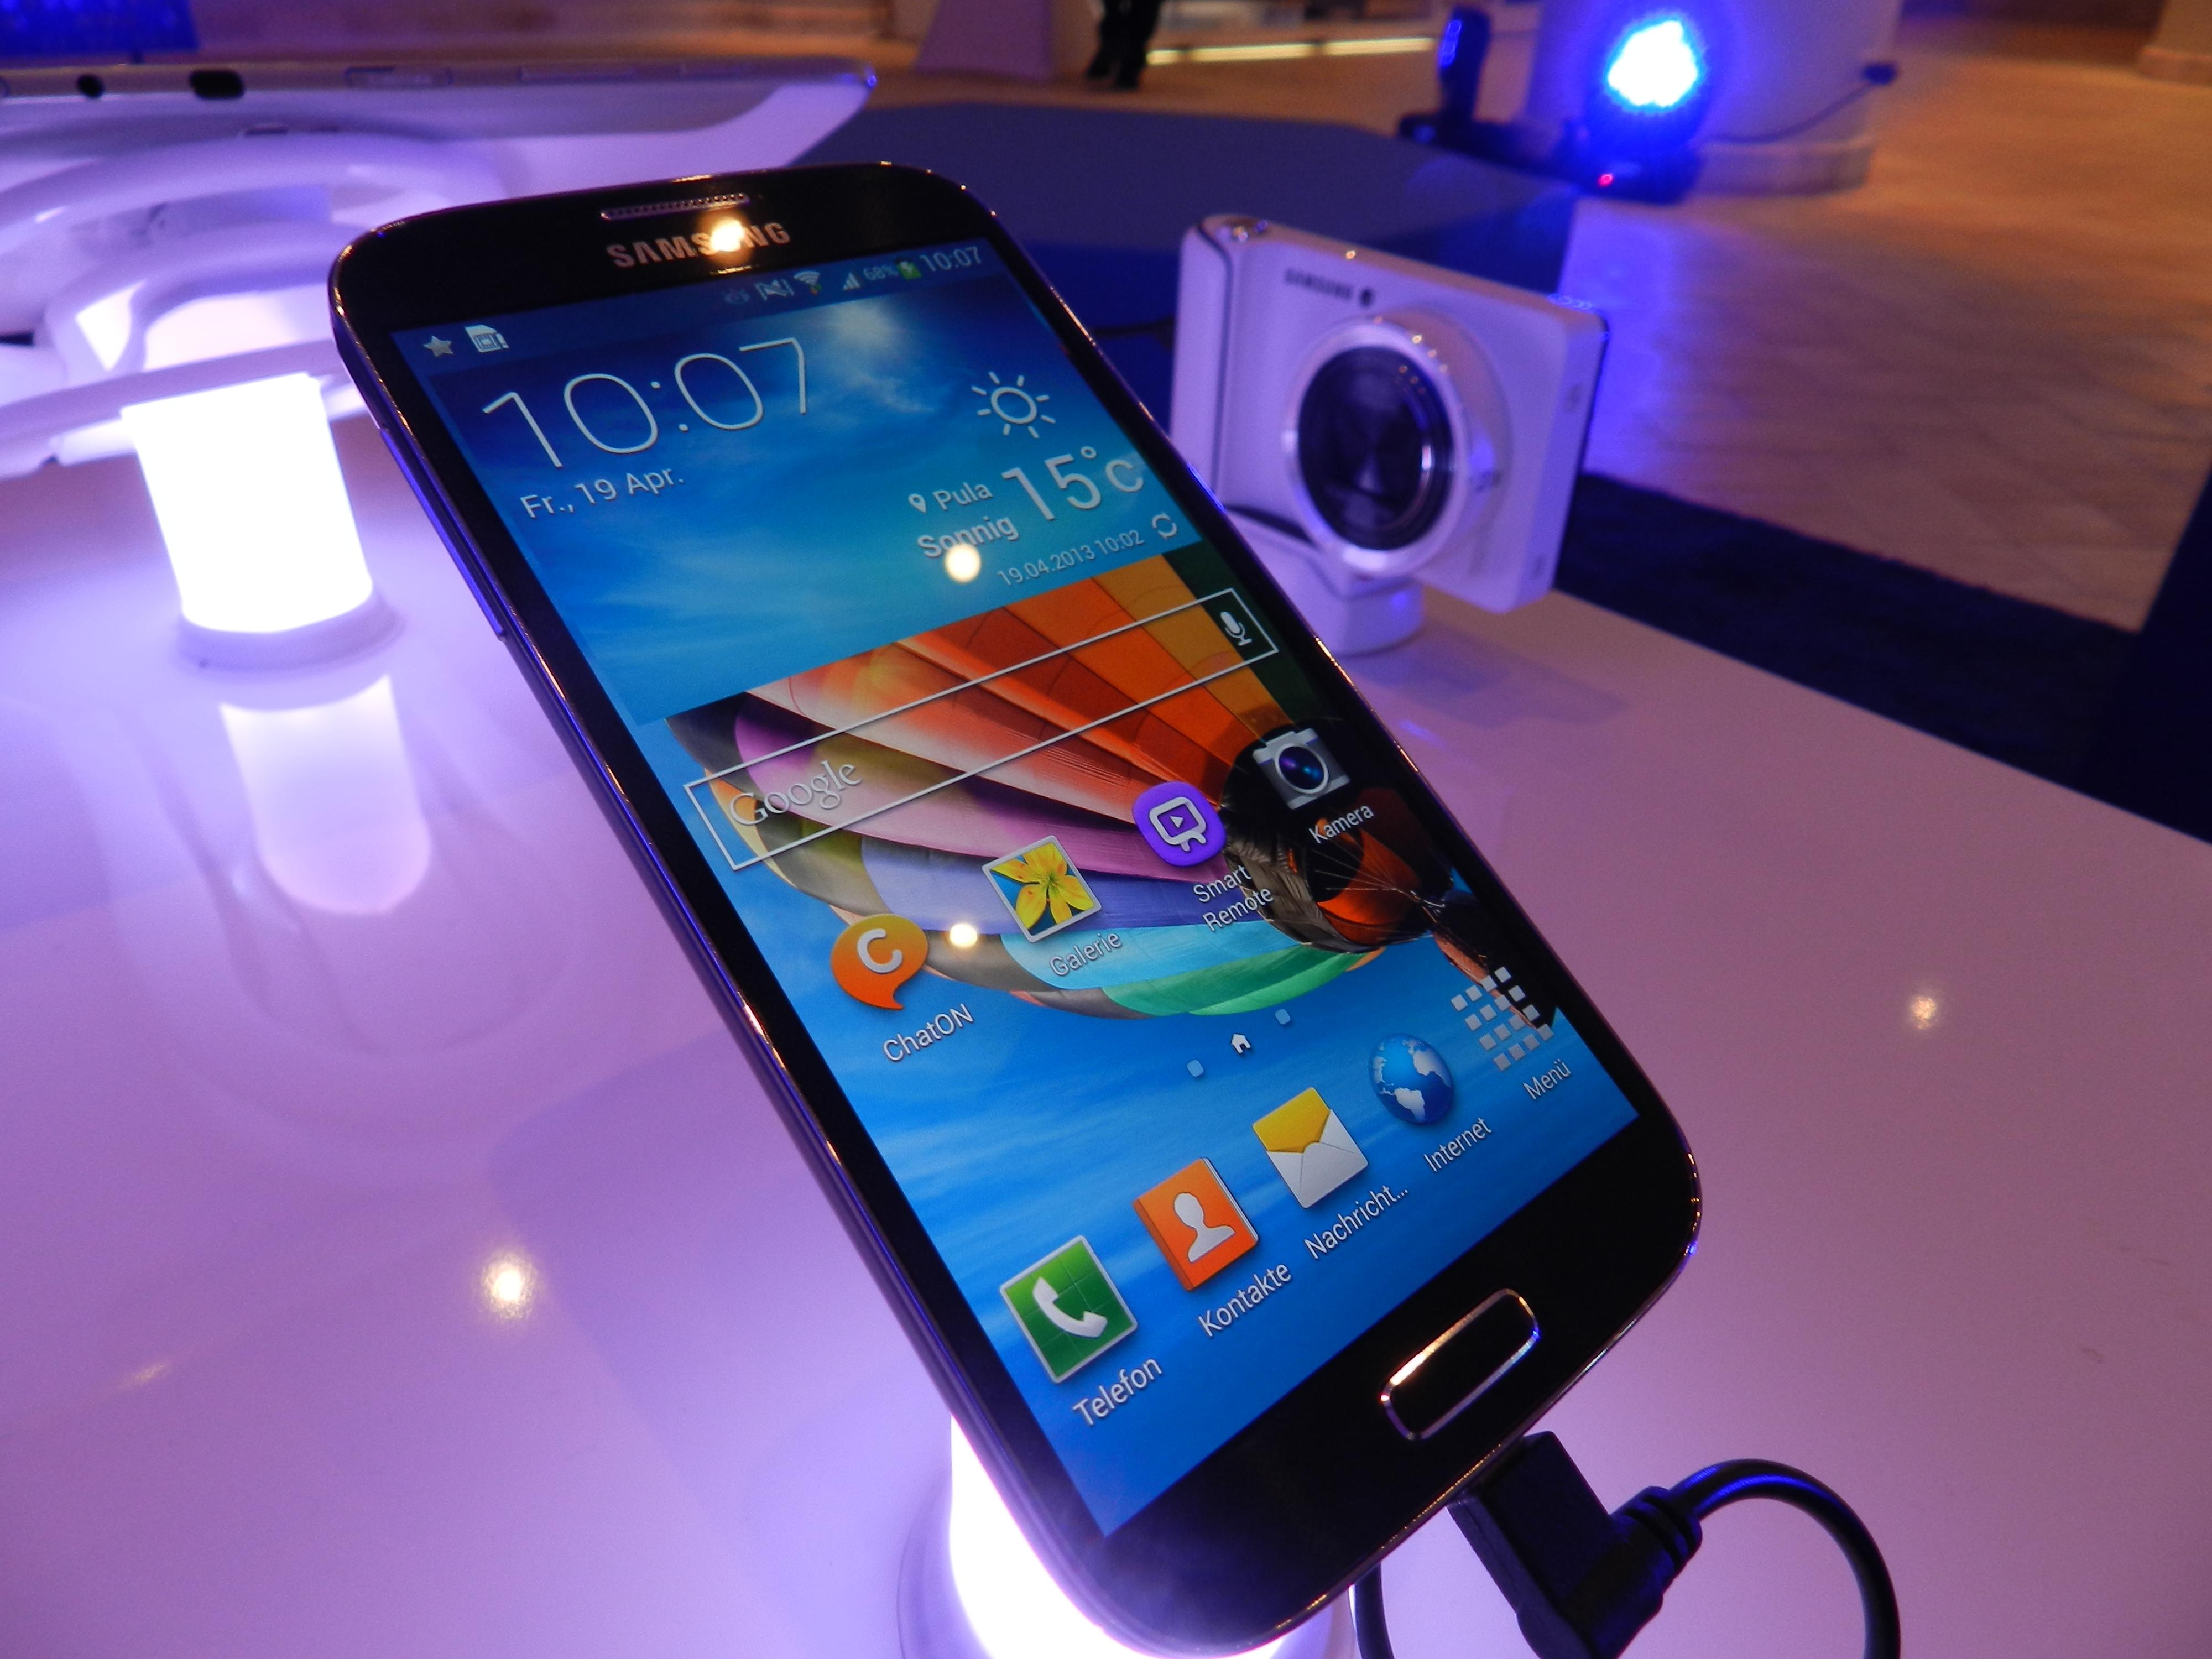 Samsung-Galaxy-S4-IFA-GPC-2013